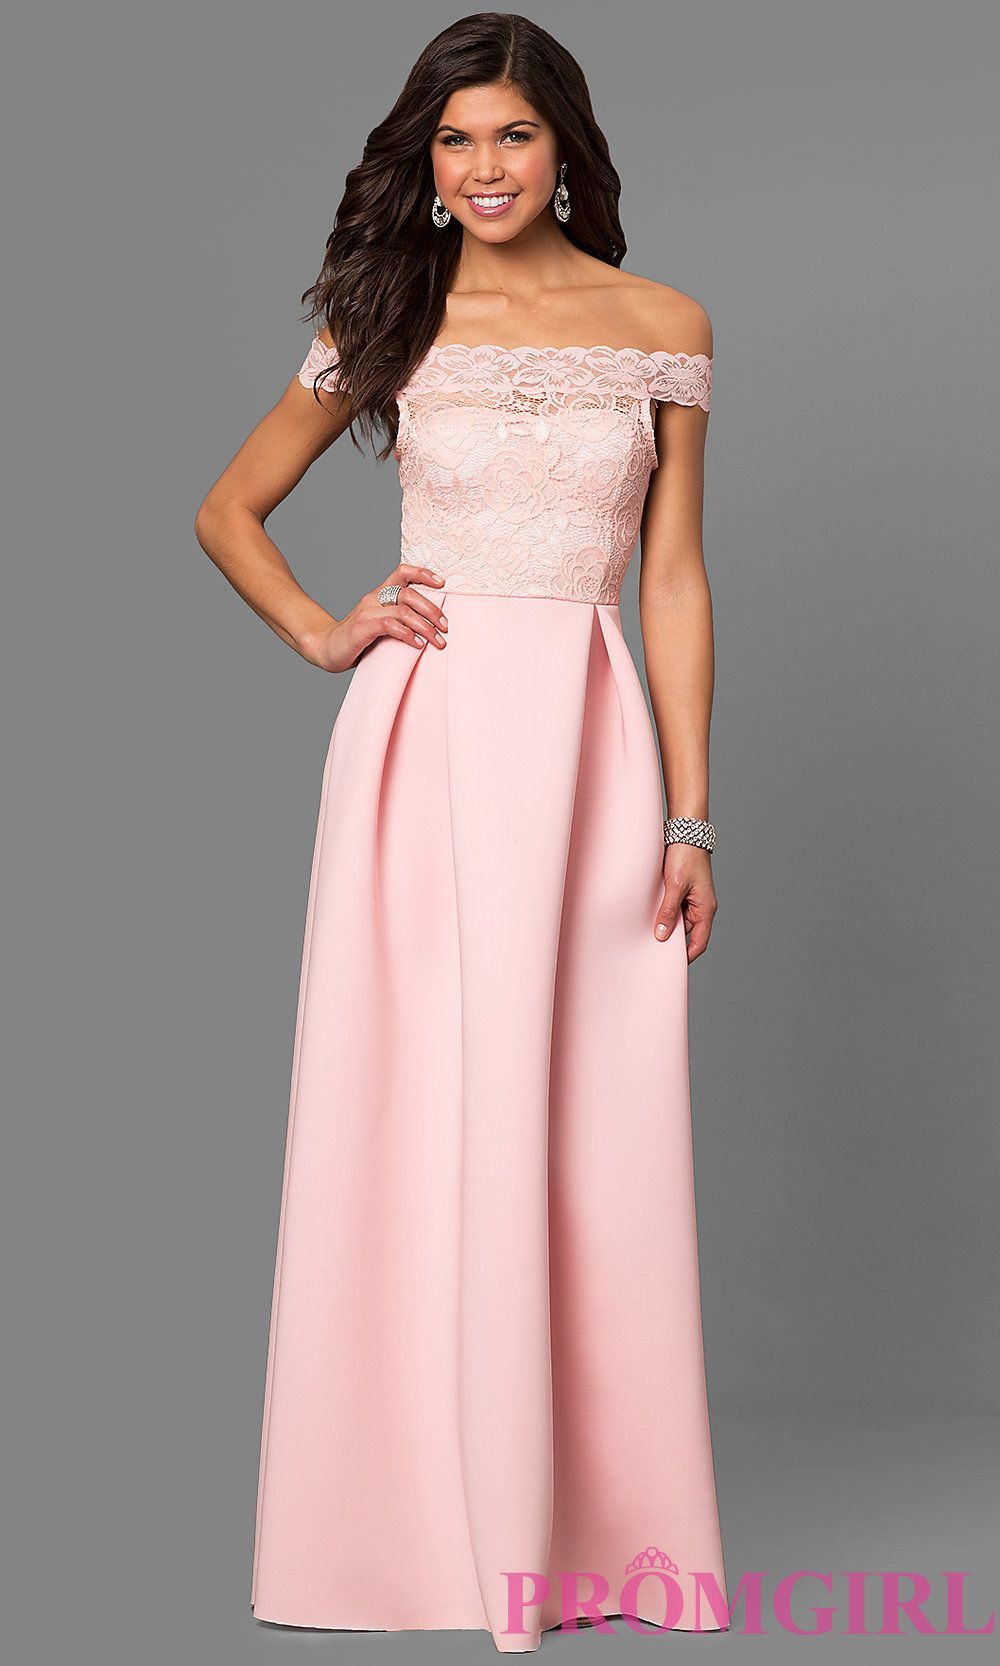 Lujoso Prom Girl Black Dress Cresta - Colección de Vestidos de Boda ...